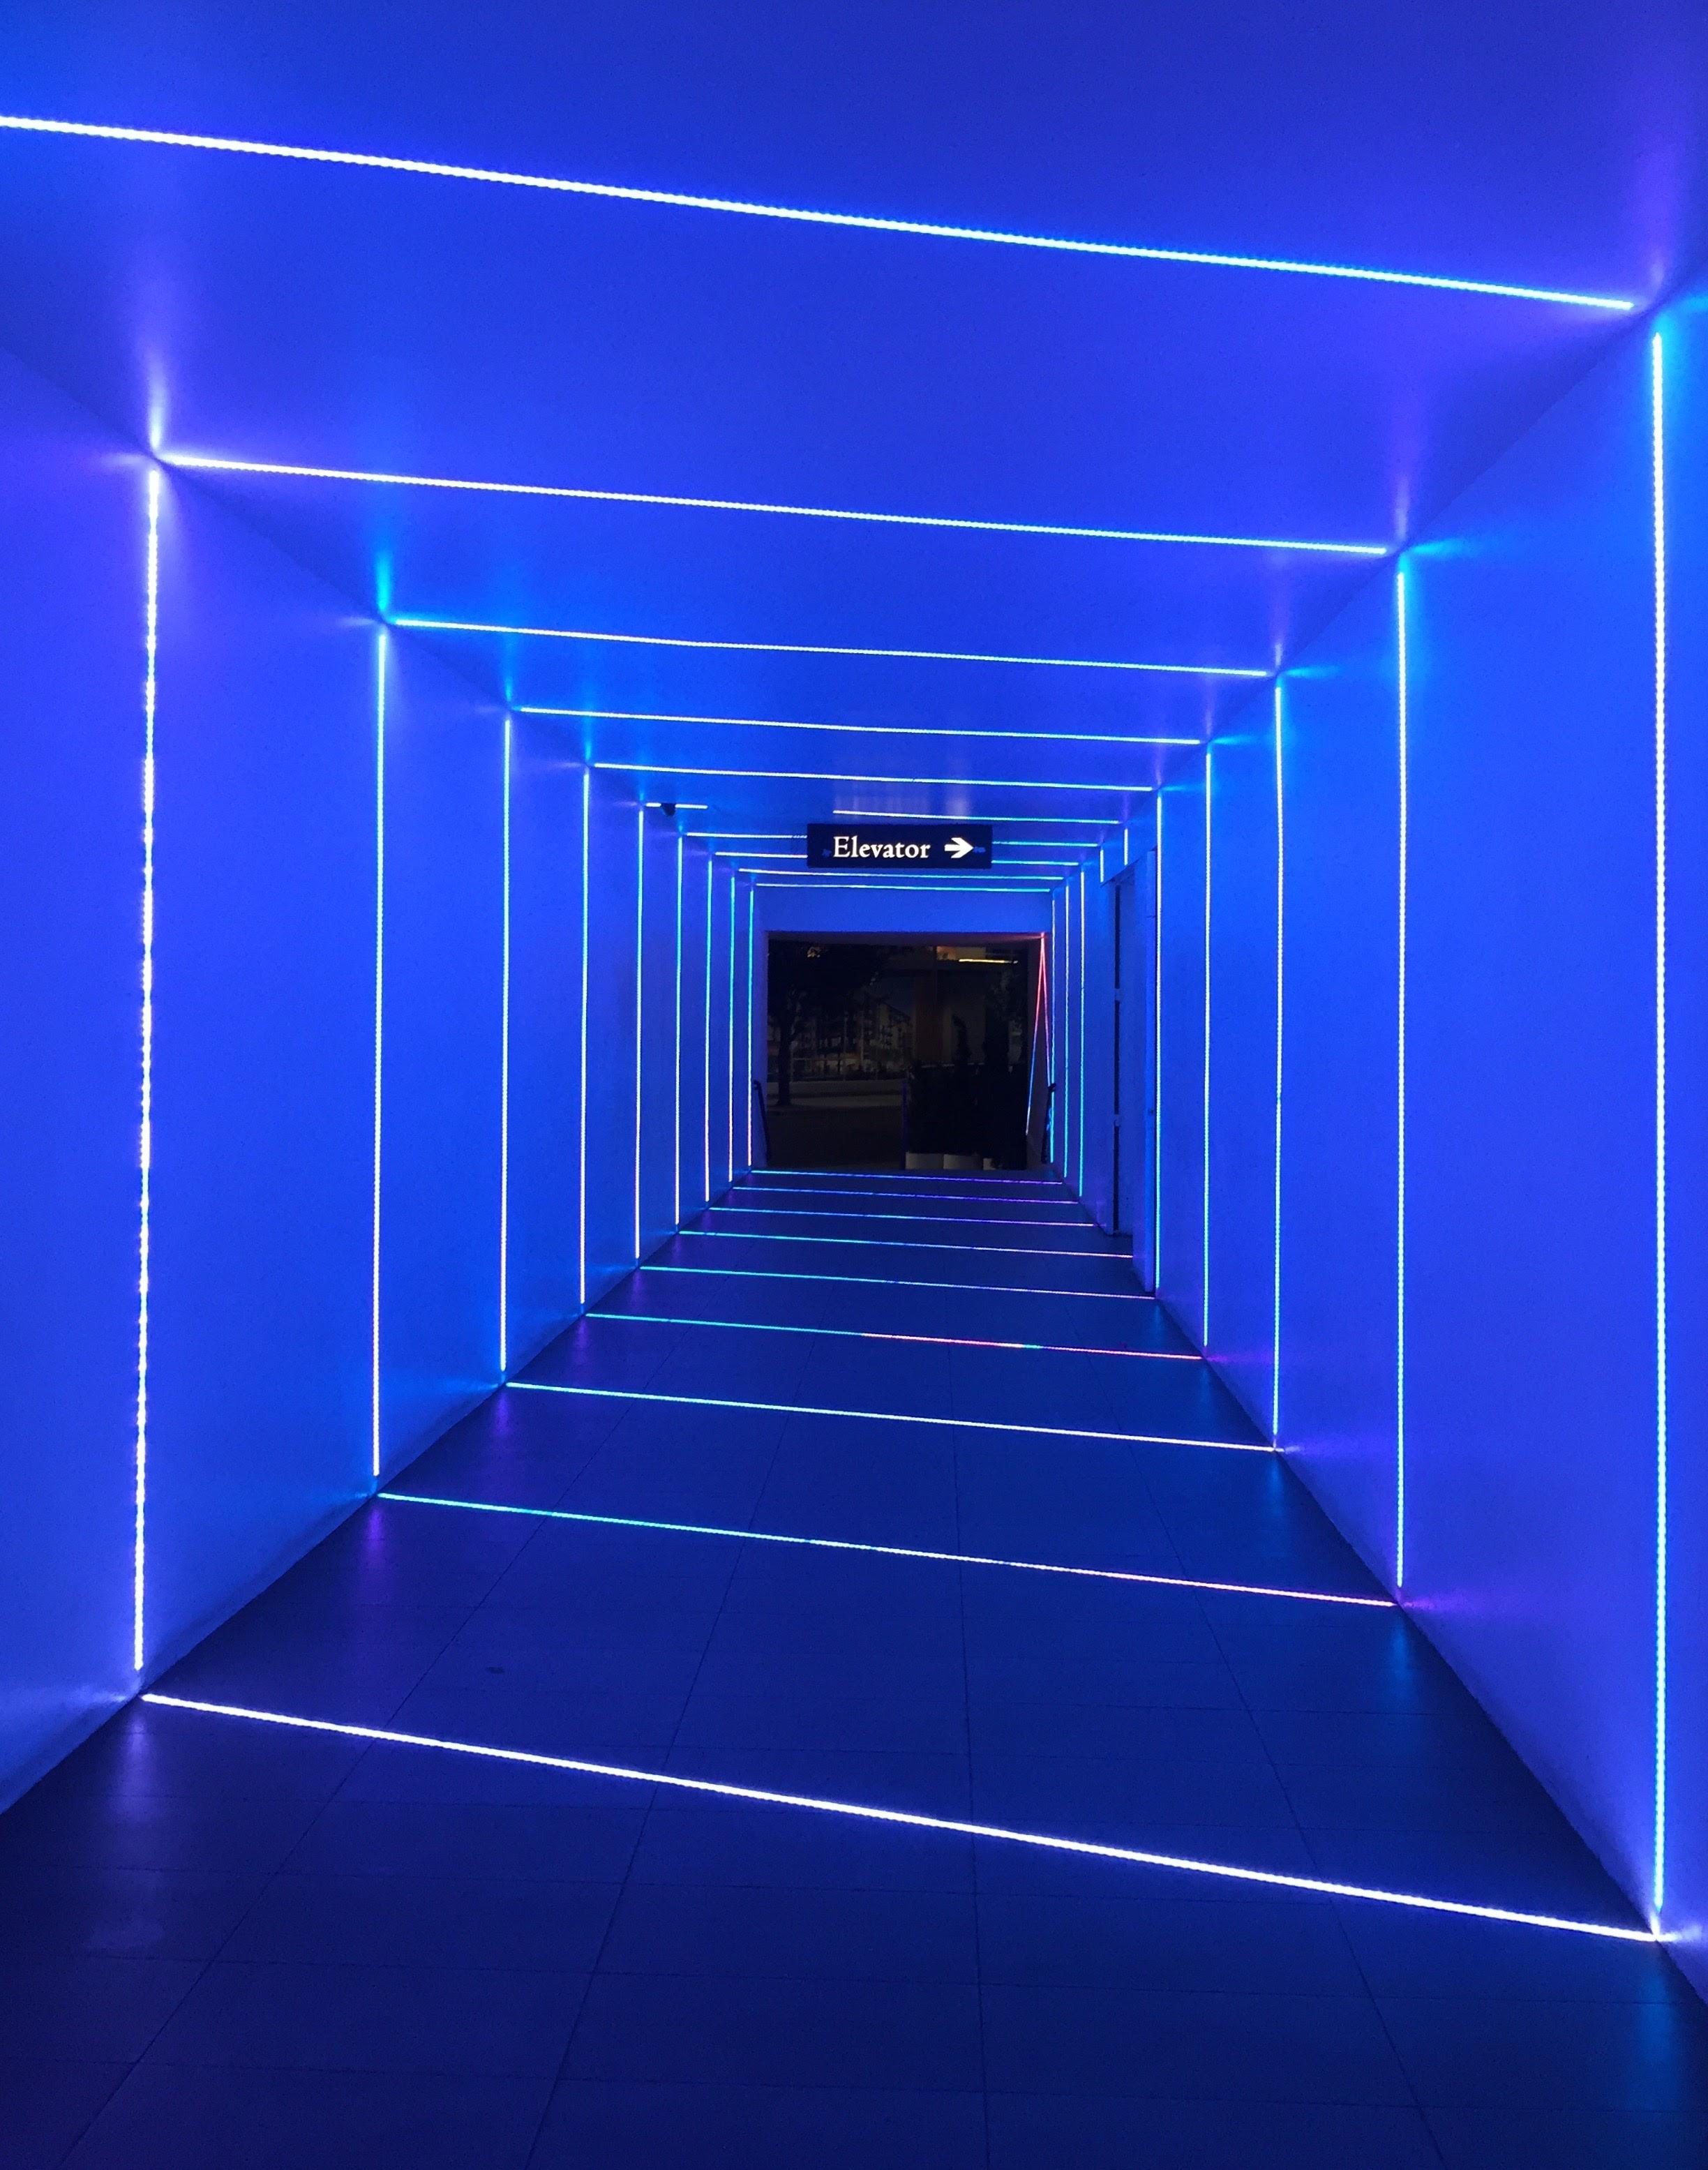 Portal by Akiko Yamashita